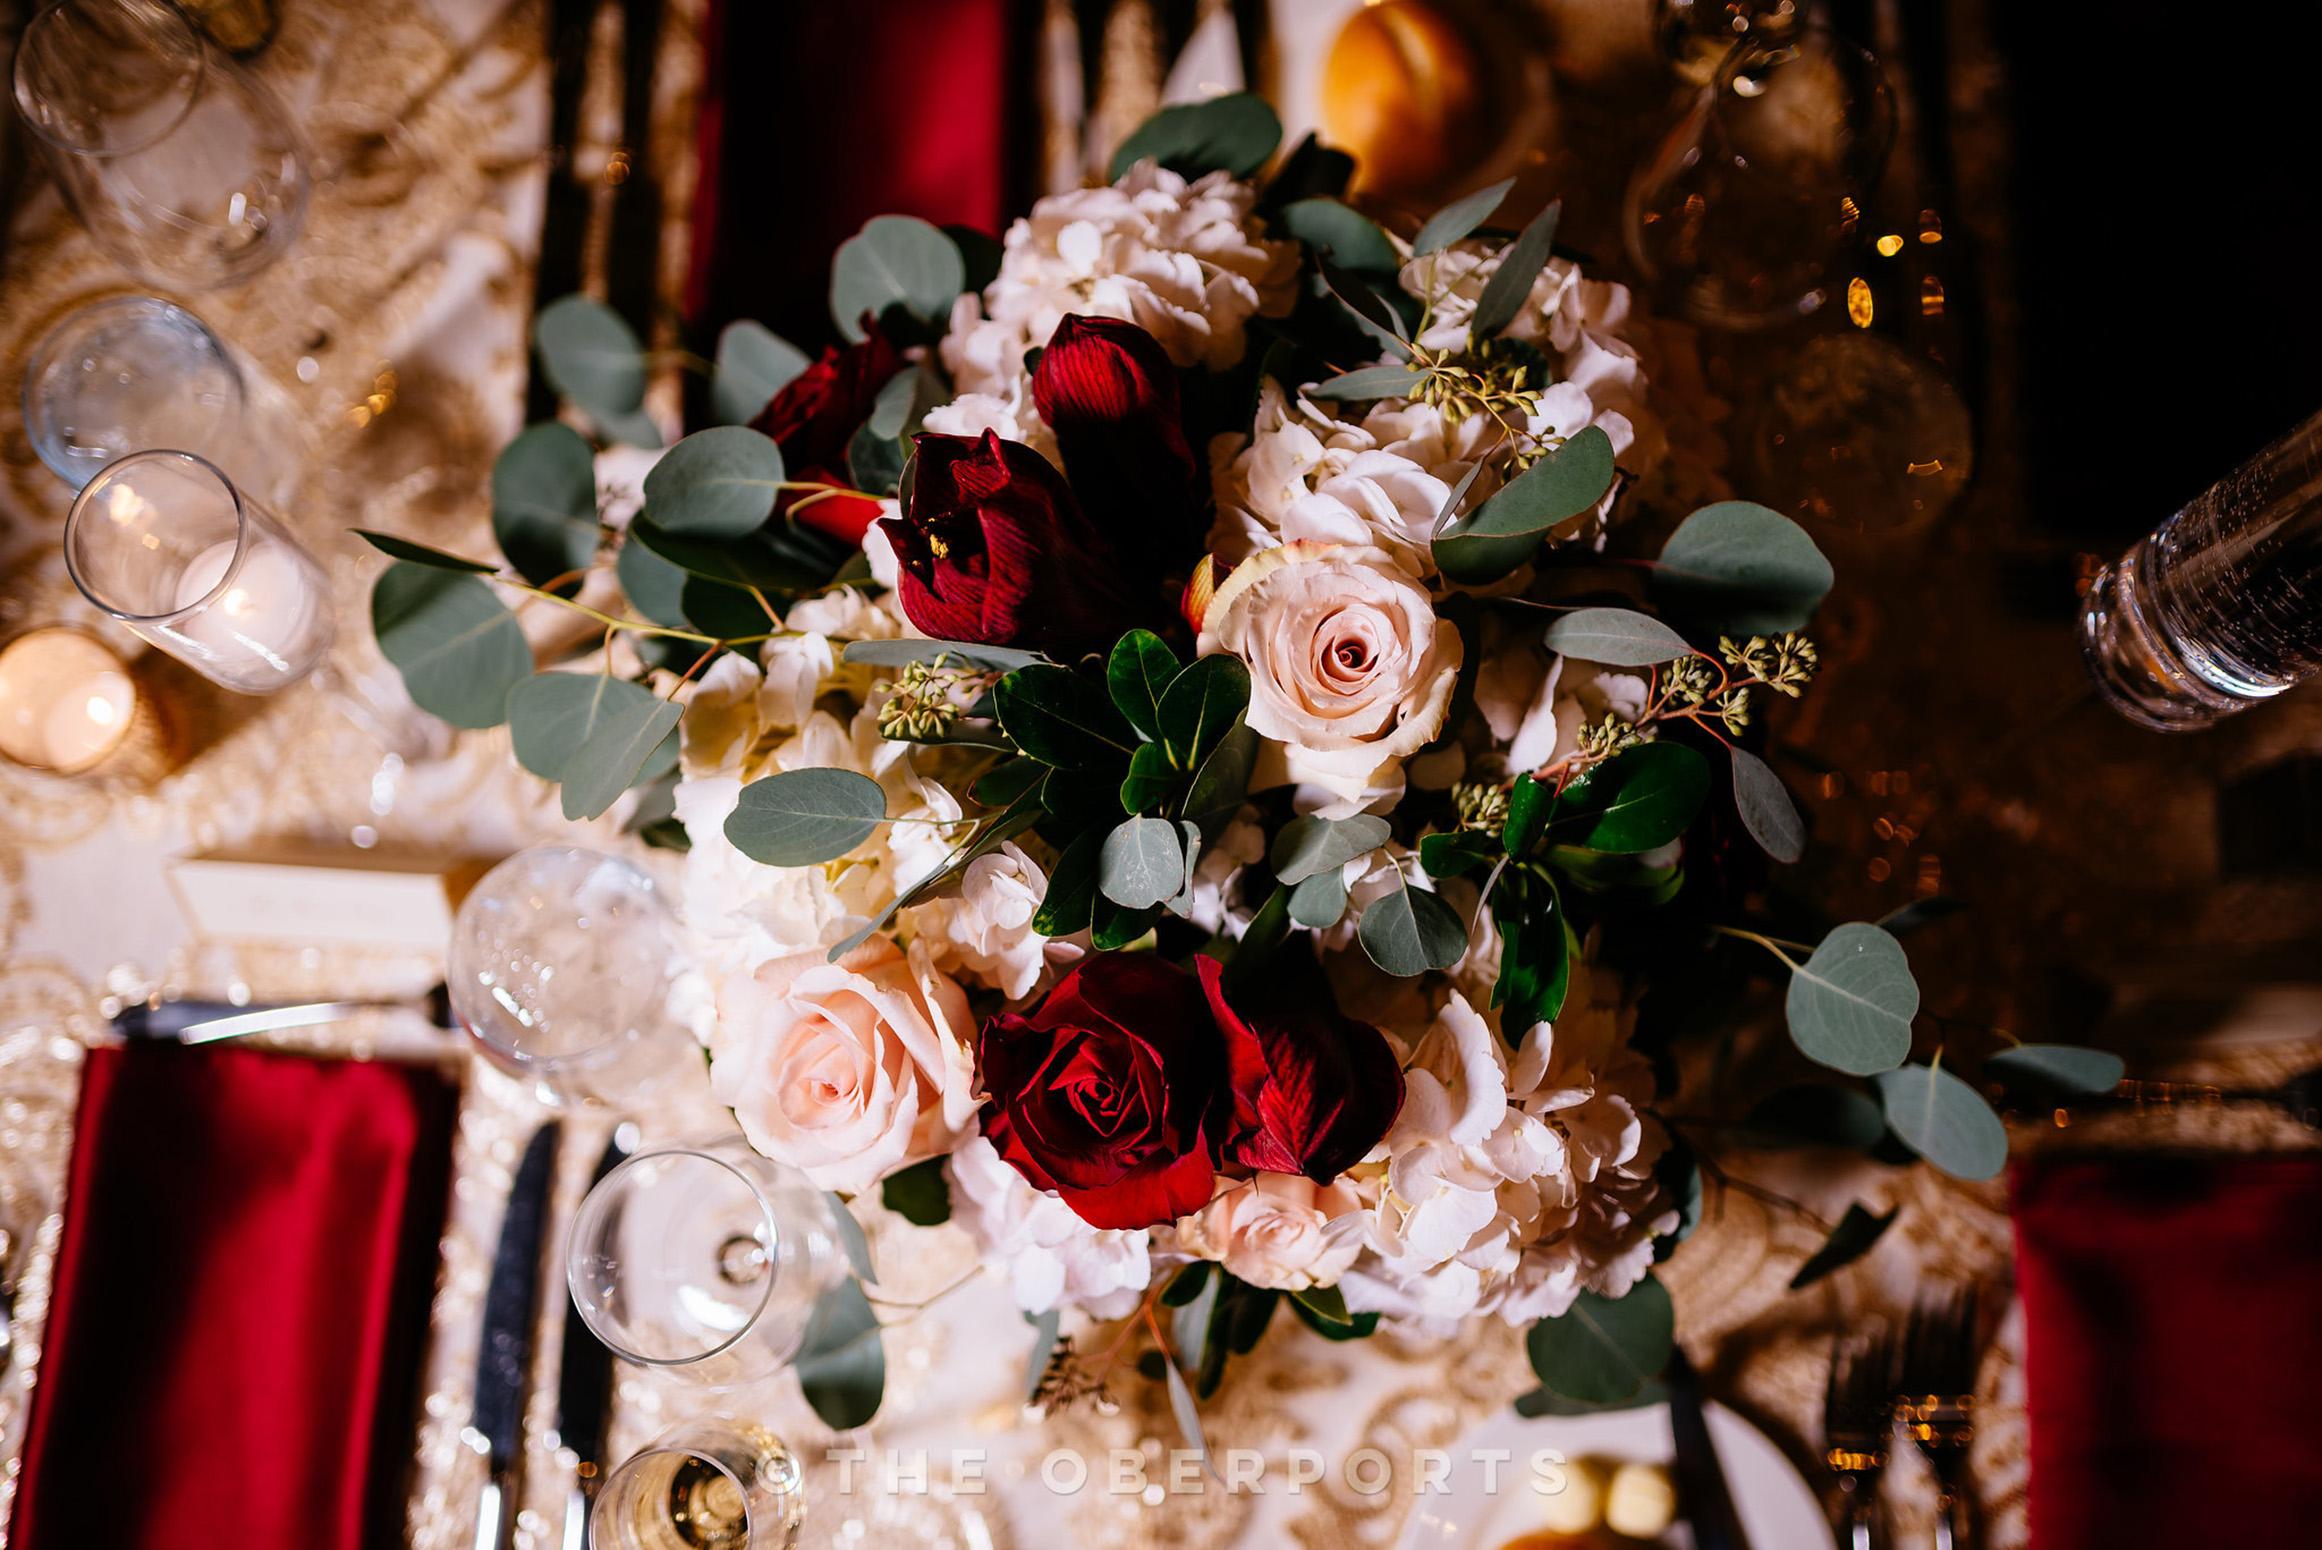 575-joaniechris-wedding.jpg